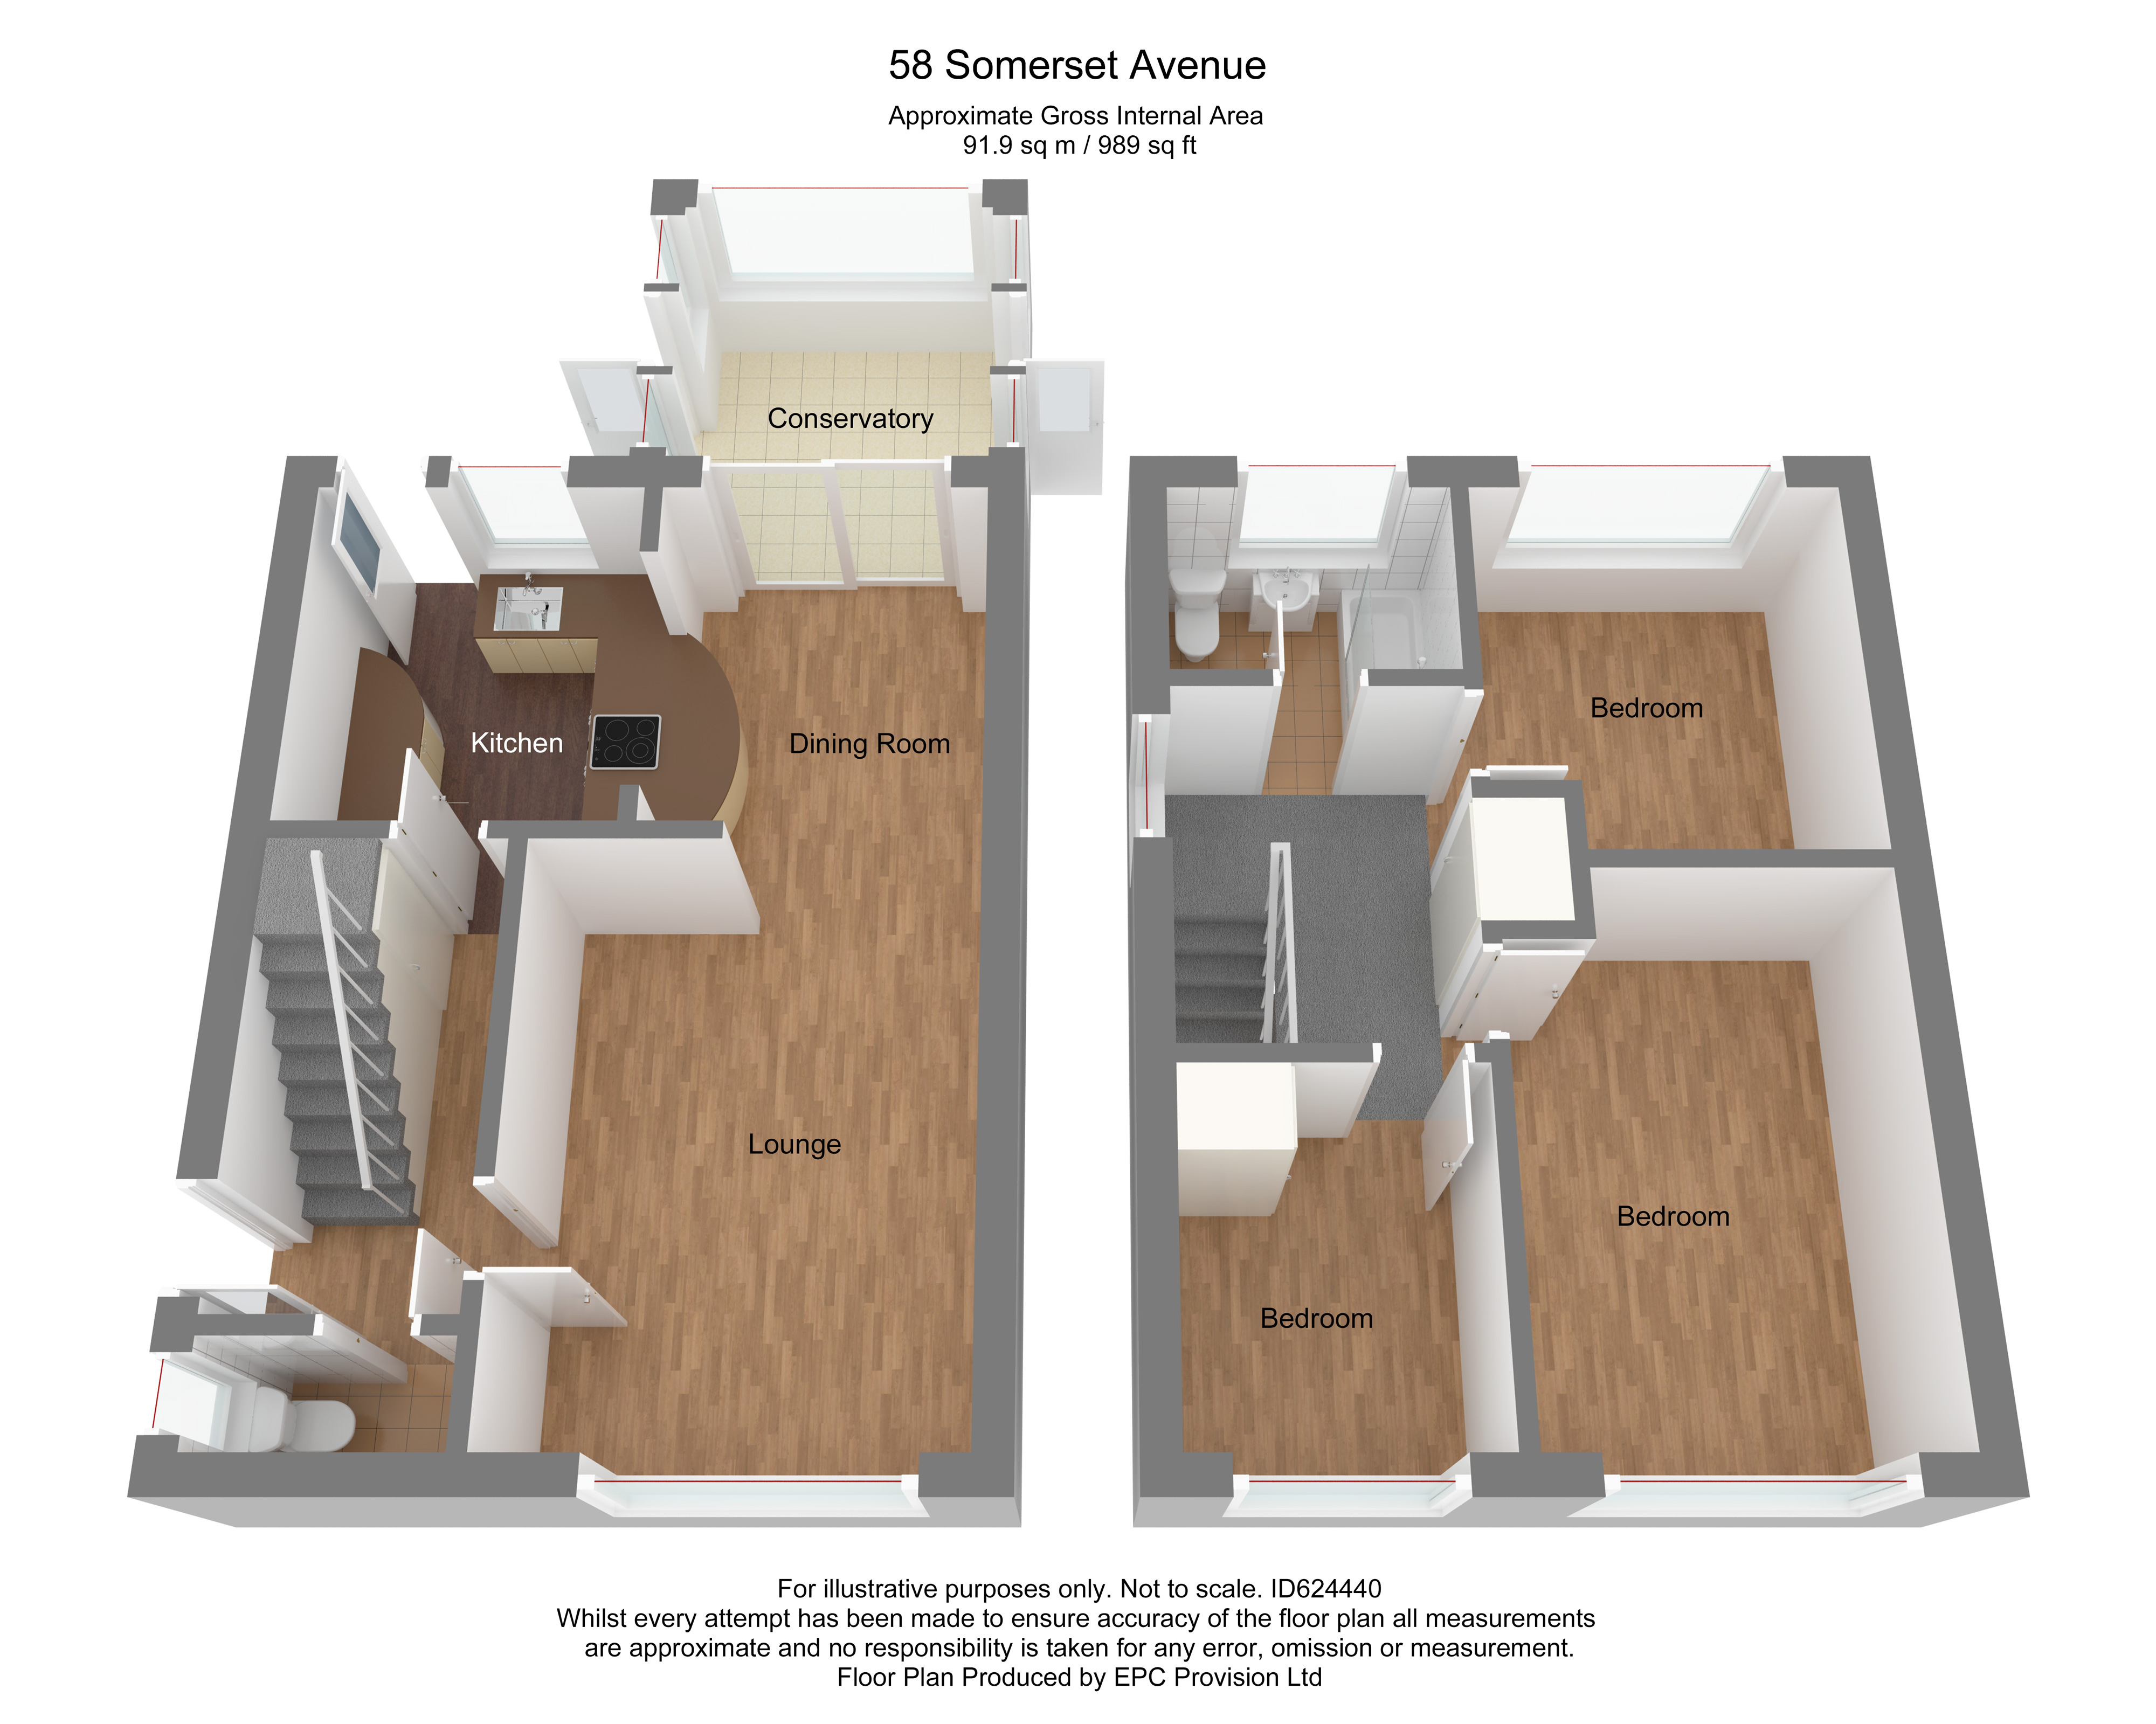 Floorplan for Somerset Avenue, Yate.